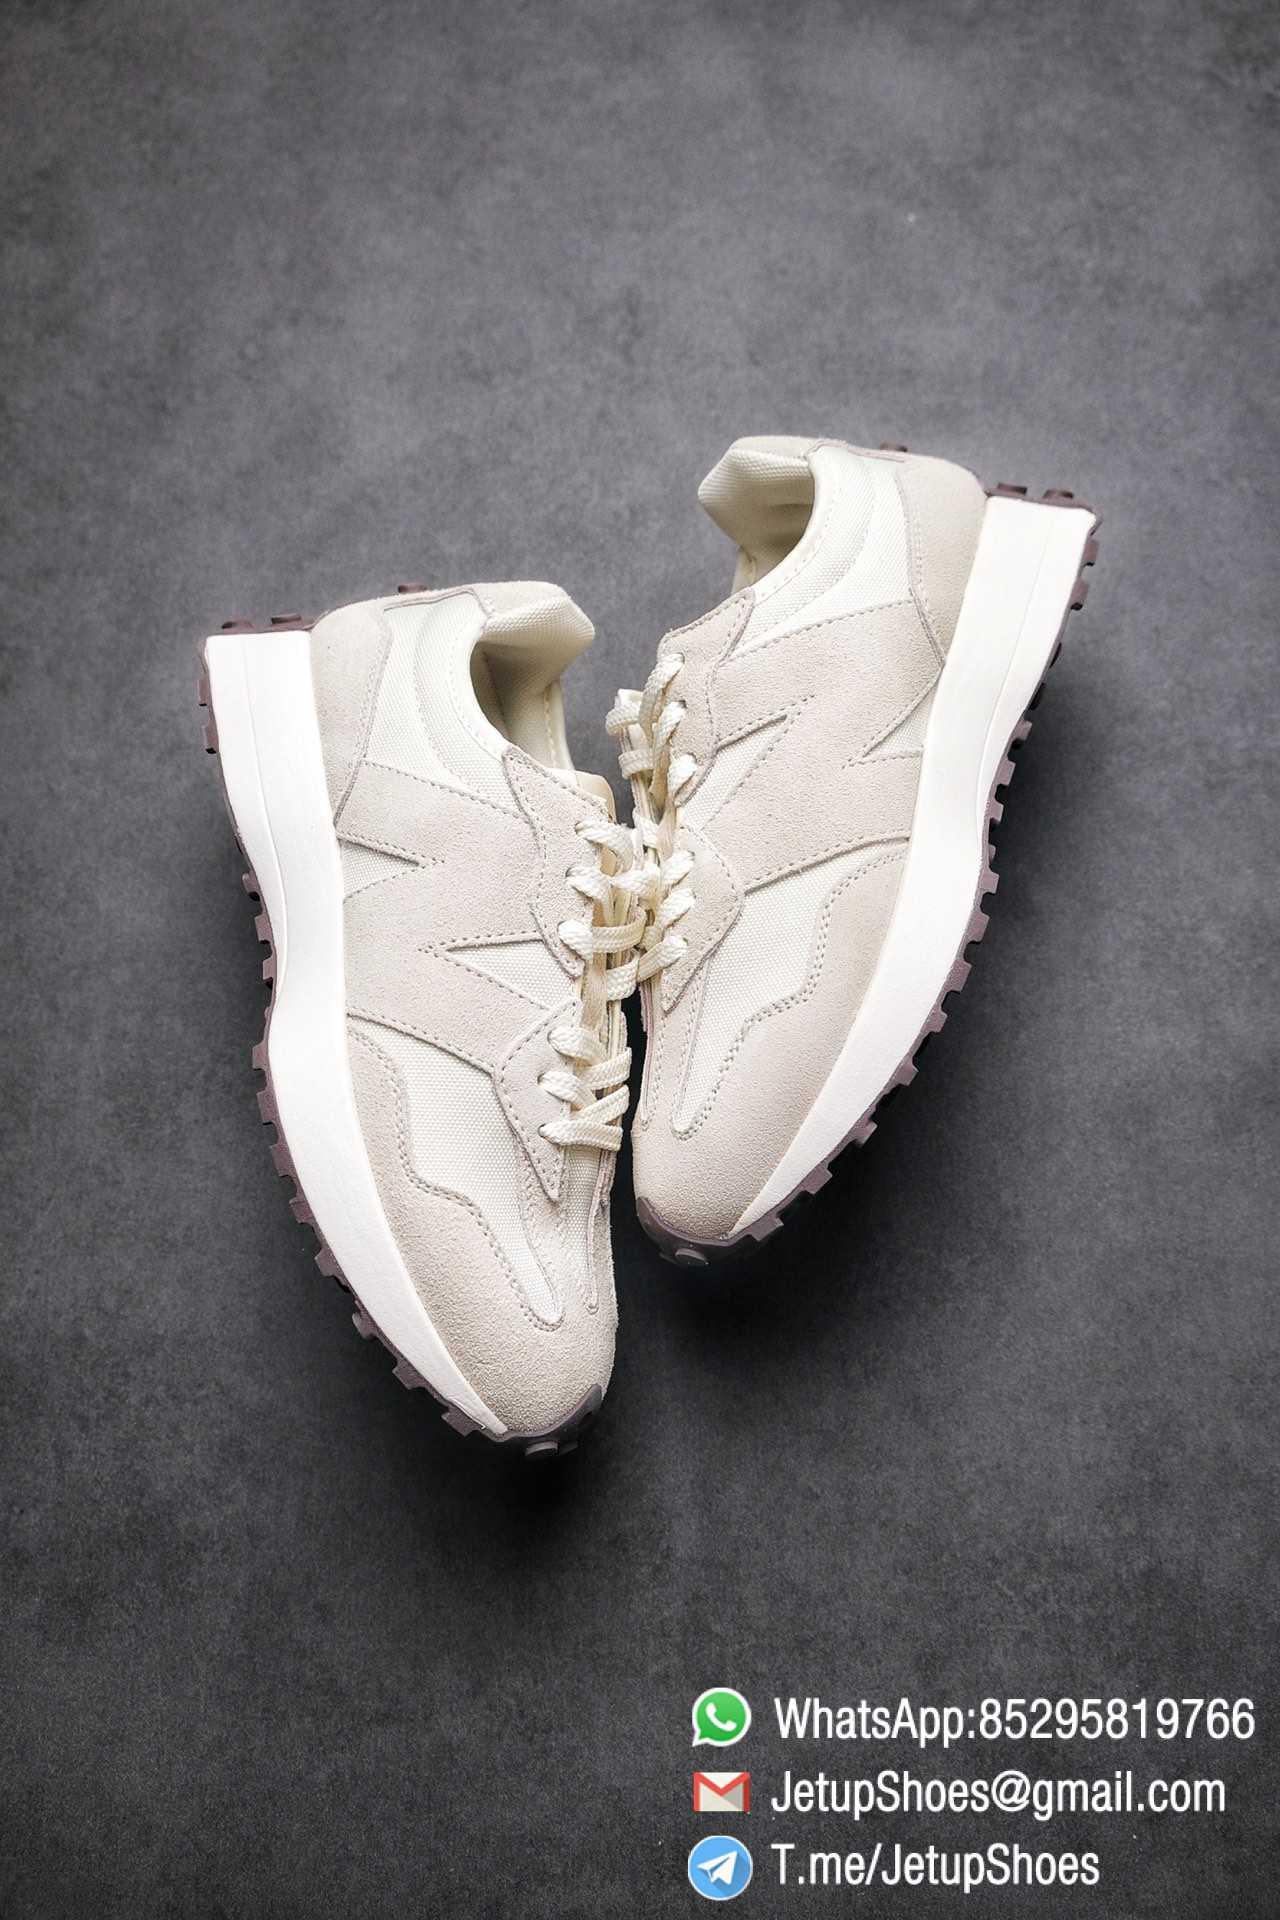 Replica Sneakers New Balance 327 Noritake x 327 Light Grey White Mesh Quarter Suede Upper Retro Running Shoes SKU WS327FB 03